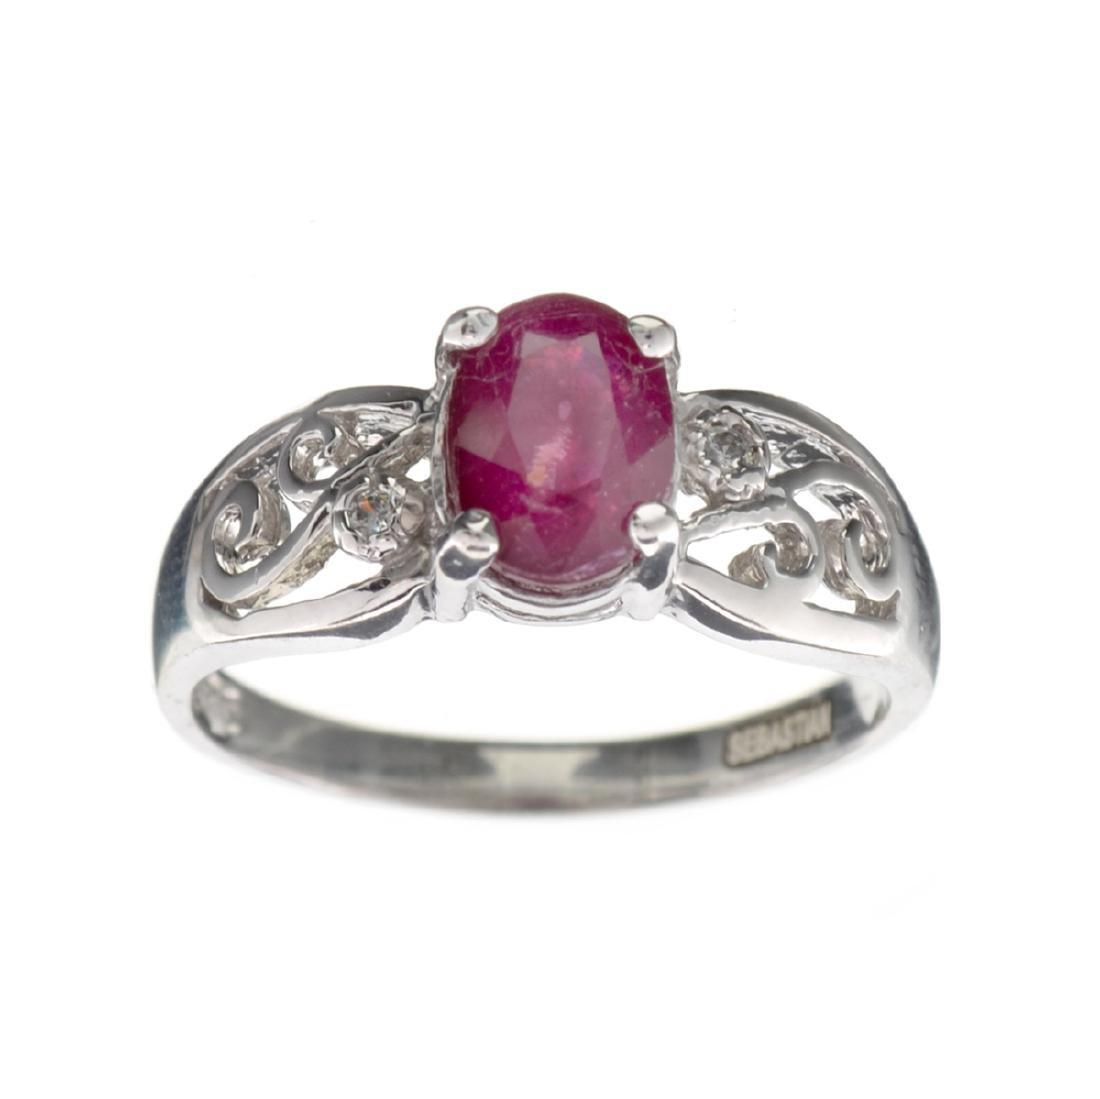 APP: 0.5k Fine Jewelry Designer Sebastian, 1.65CT Ruby